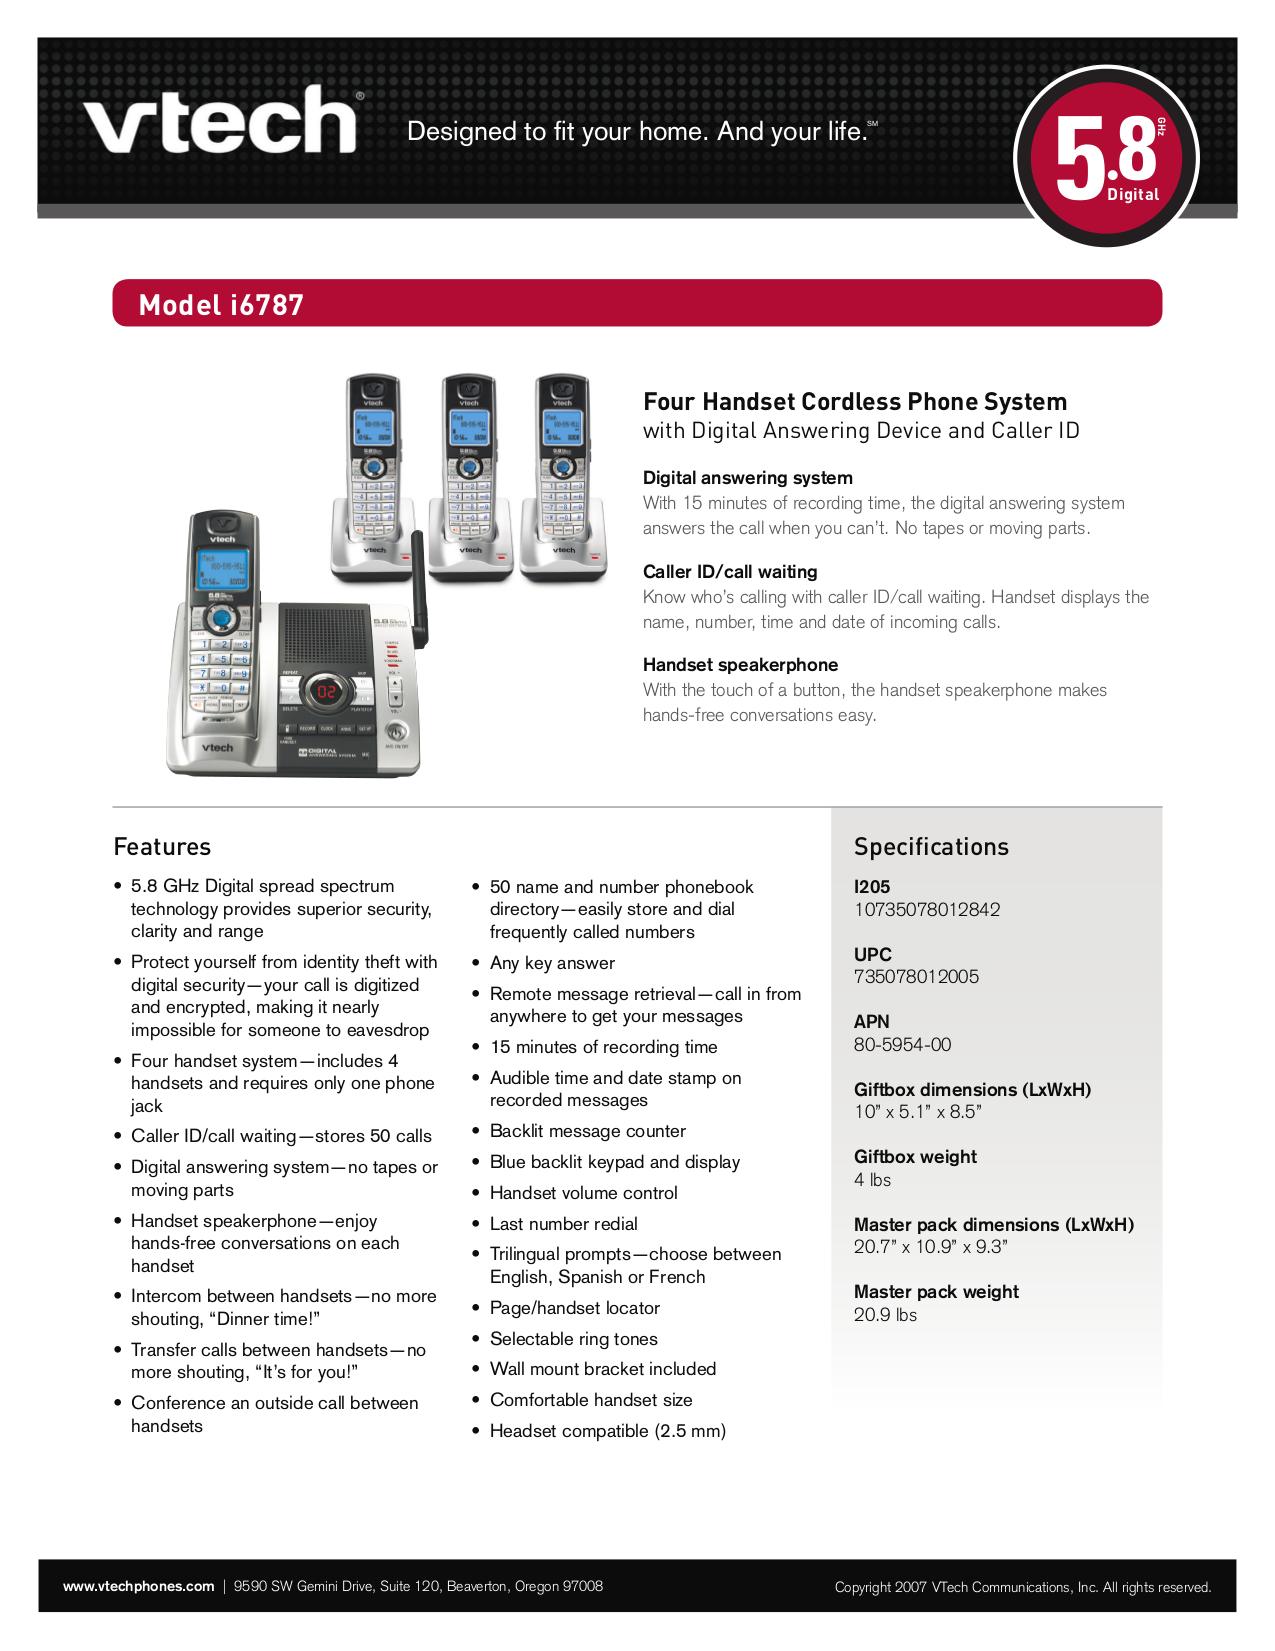 pdf for Vtech Telephone i6787 manual